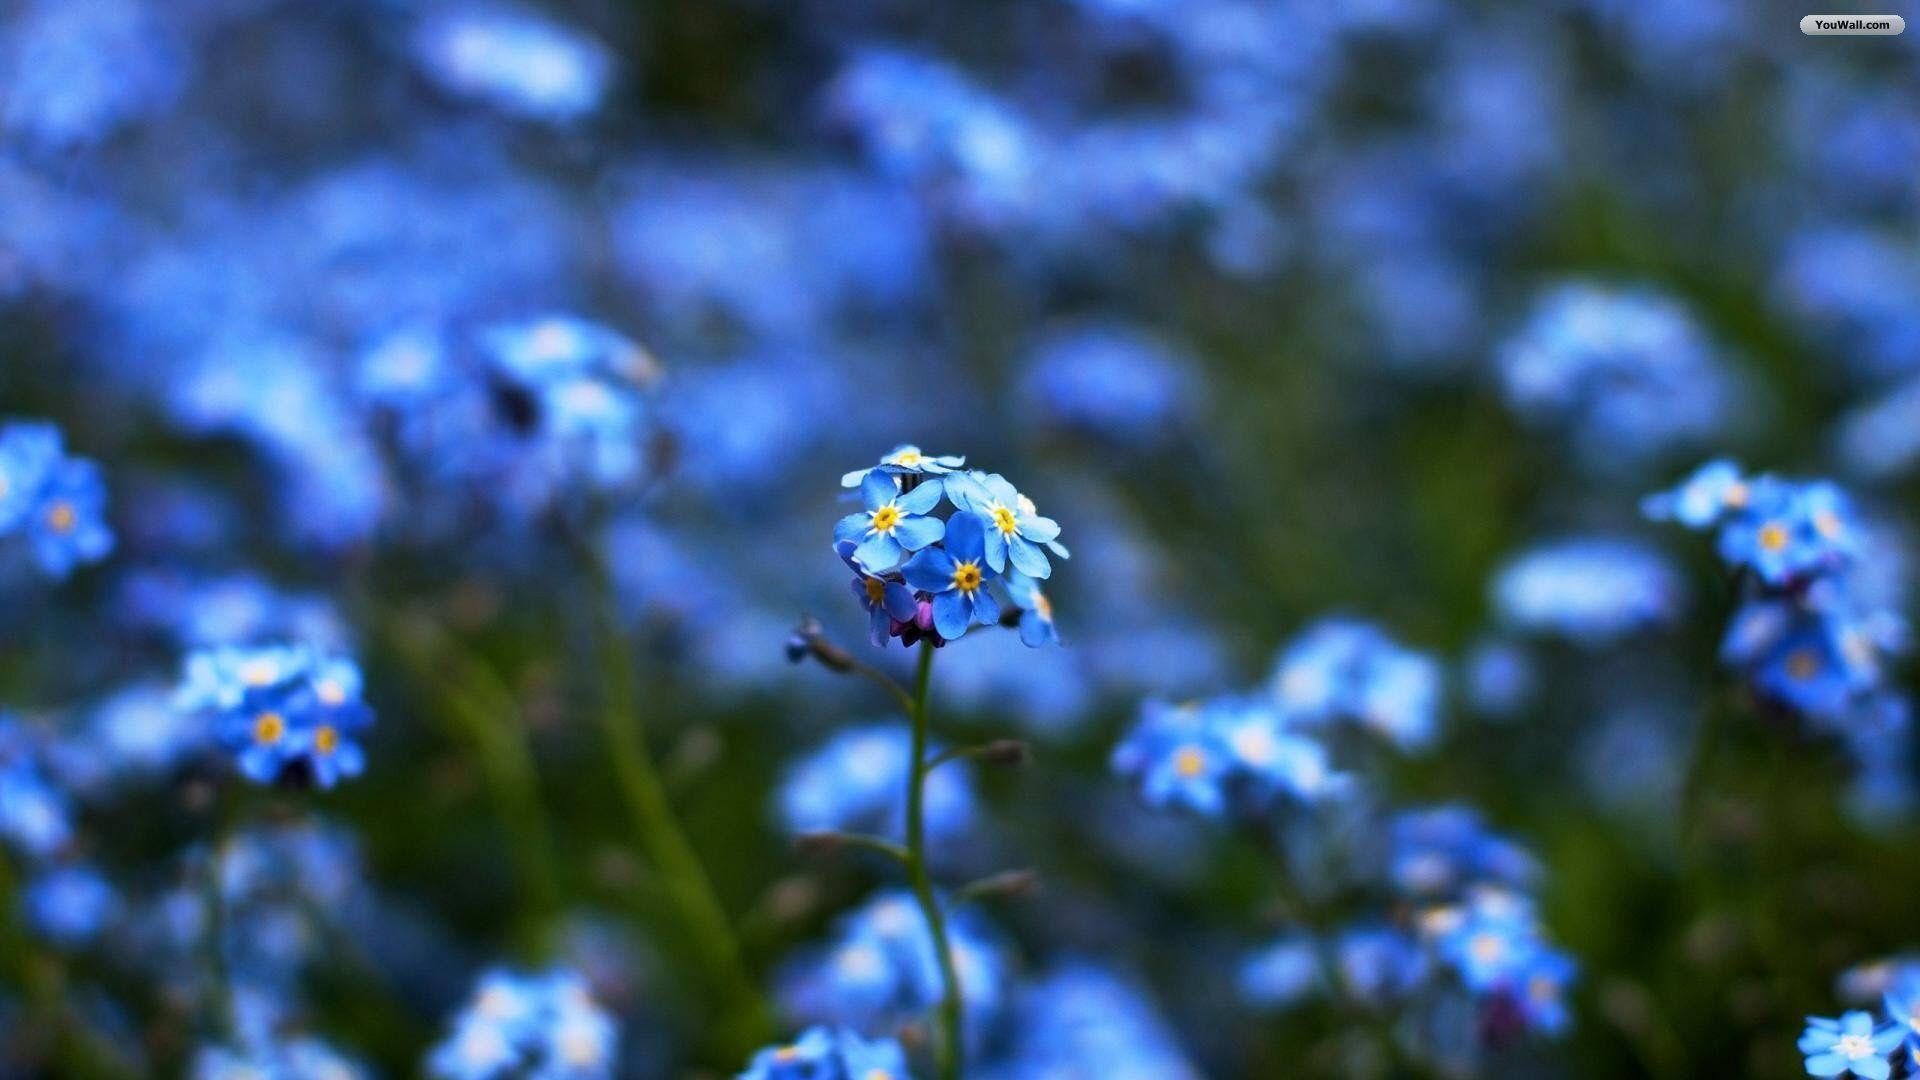 Blue flowers wallpapers wallpaper cave blue flowers pictures widescreen 2 hd wallpaperscom izmirmasajfo